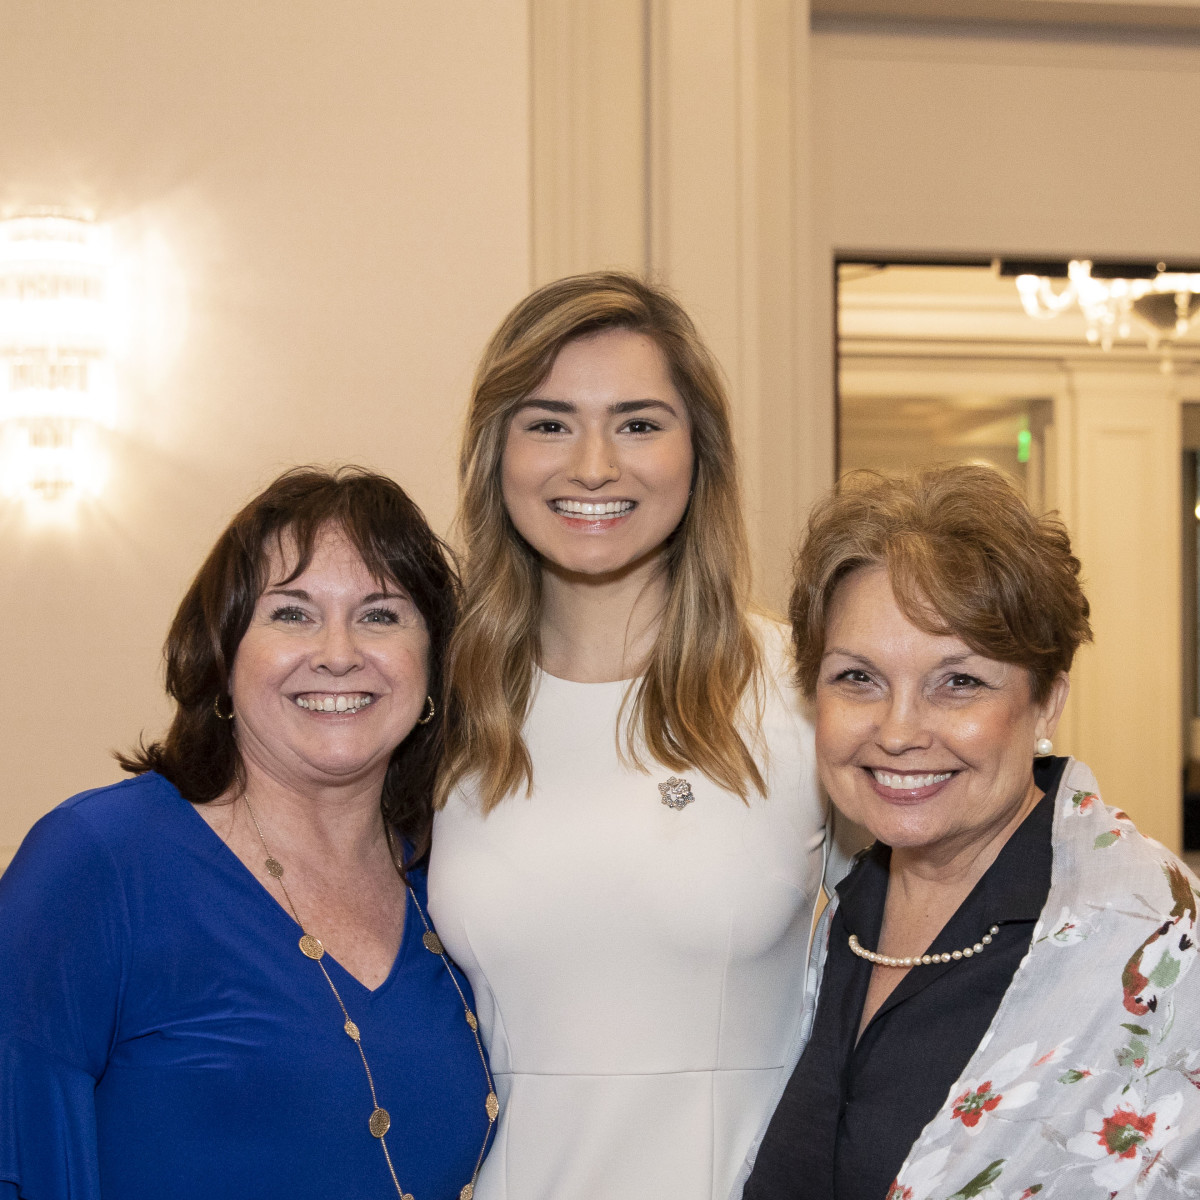 Rebeka Ecker, Victoria Ecker, Rosemary Mach